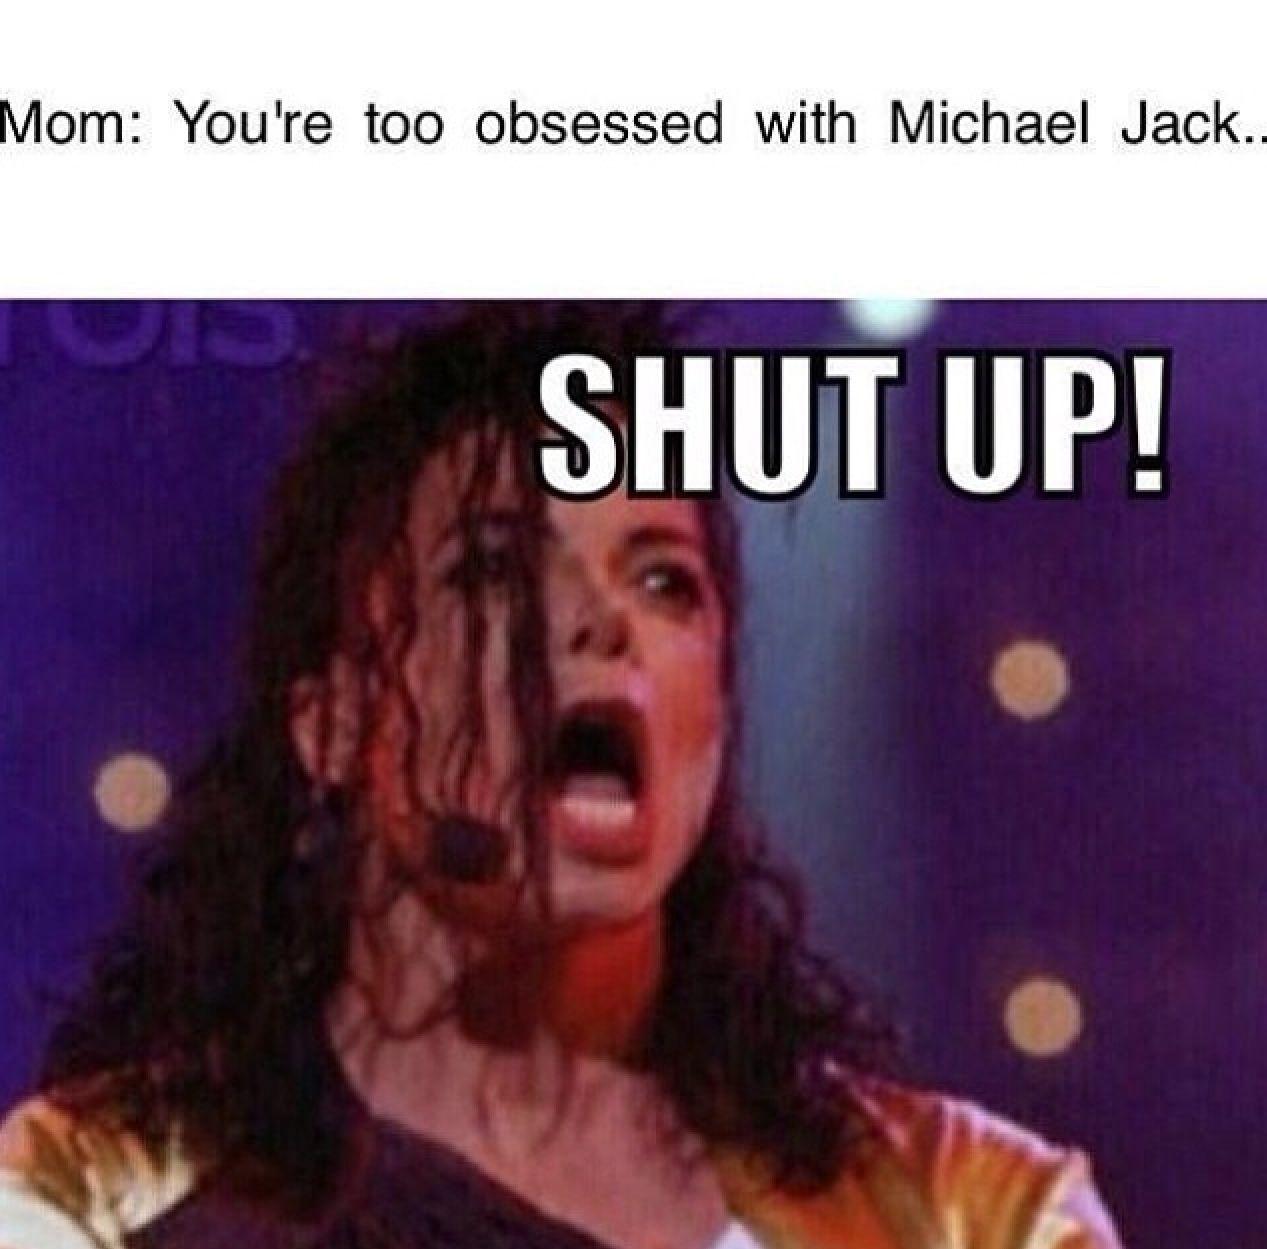 Shut Up Michael Jackson Quotes Michael Jackson Funny Michael Jackson Meme